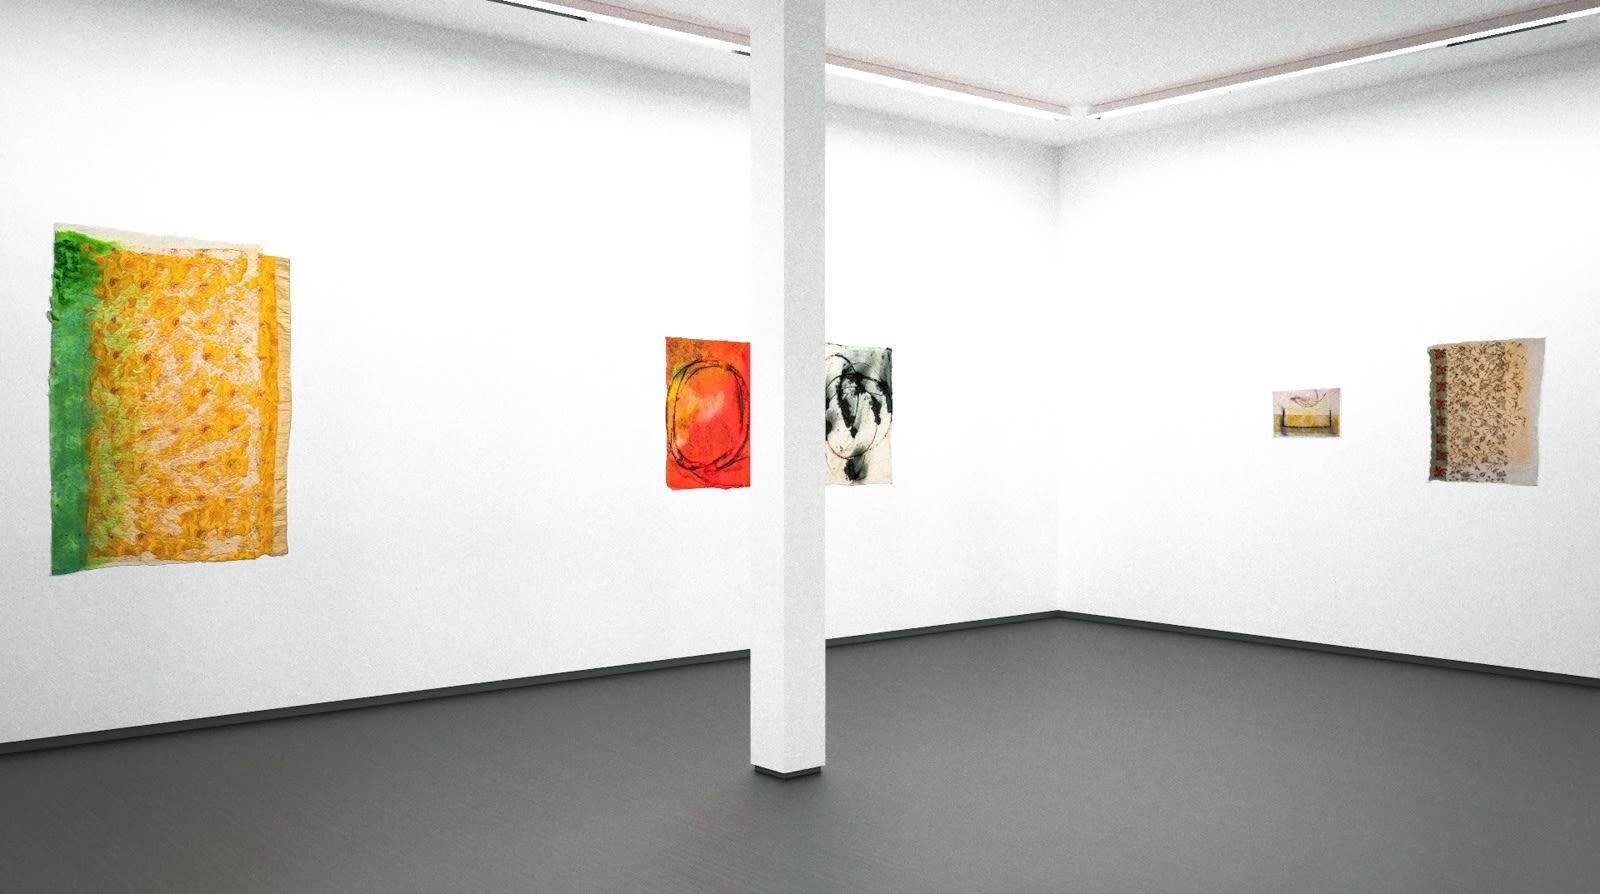 Installation view, Jessica Stockholder: As Glue, Material & Surface: Paper Works (Virtual exhibition), 2020, Kavi Gupta | Kathmandu Projects